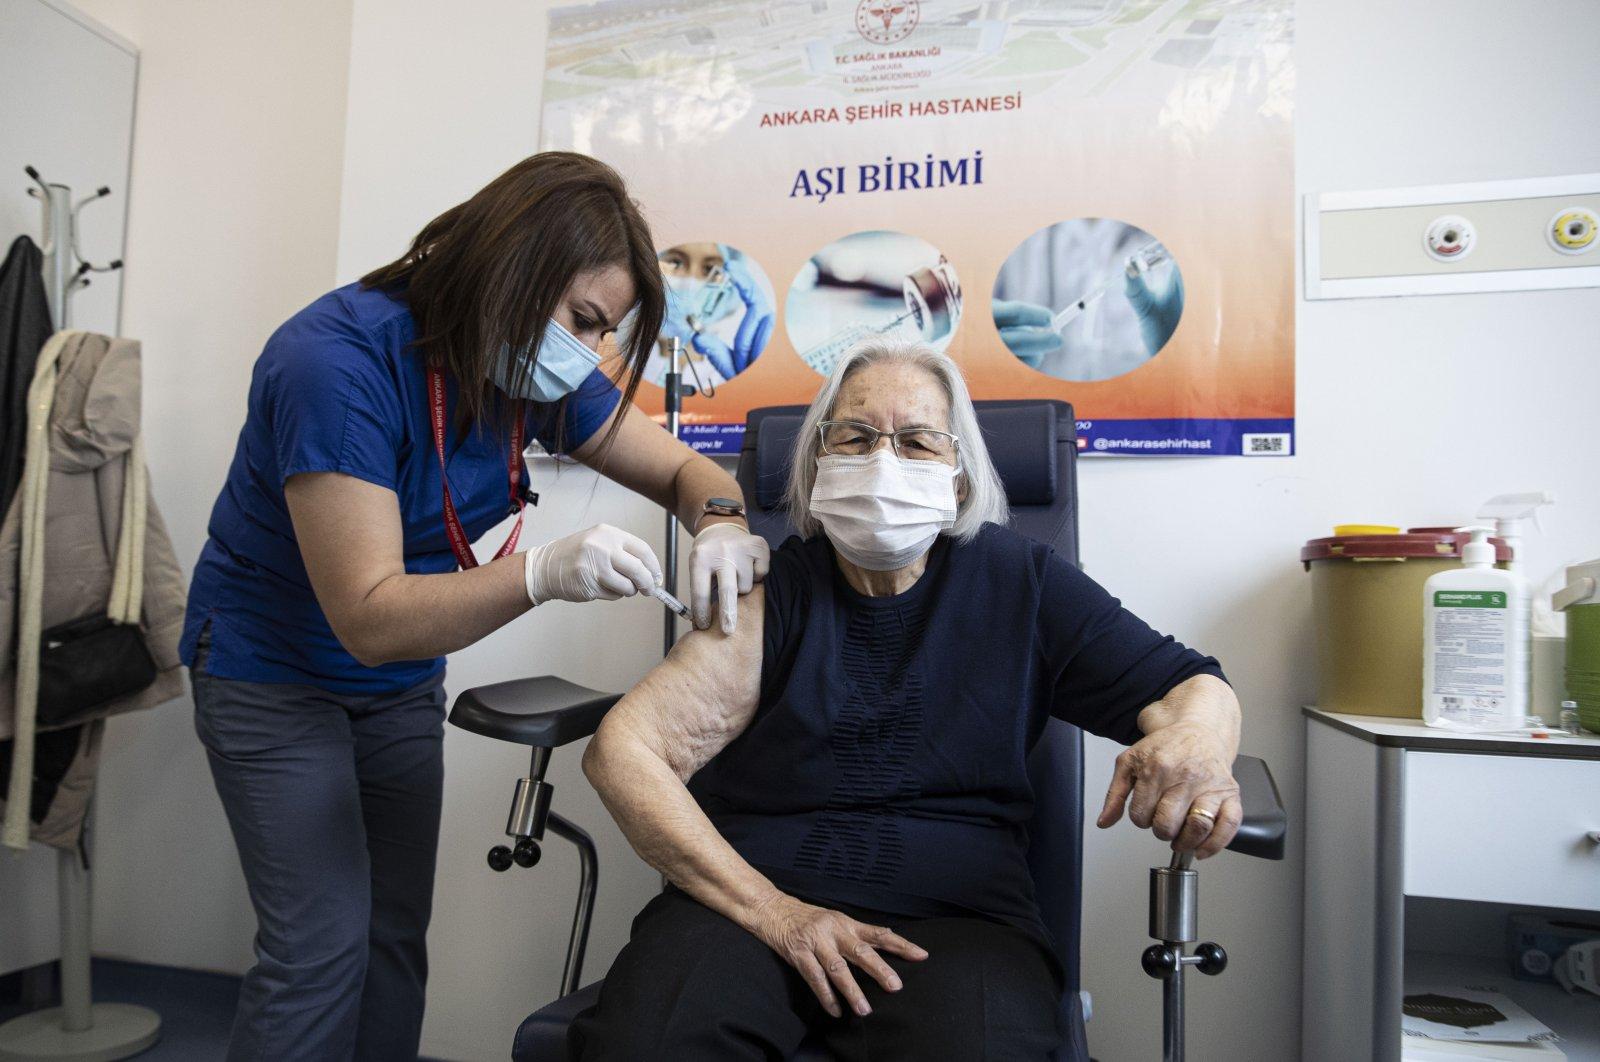 An elderly woman gets vaccinated at a hospital, in the capital Ankara, Turkey, Jan. 27, 2021. (AA PHOTO)